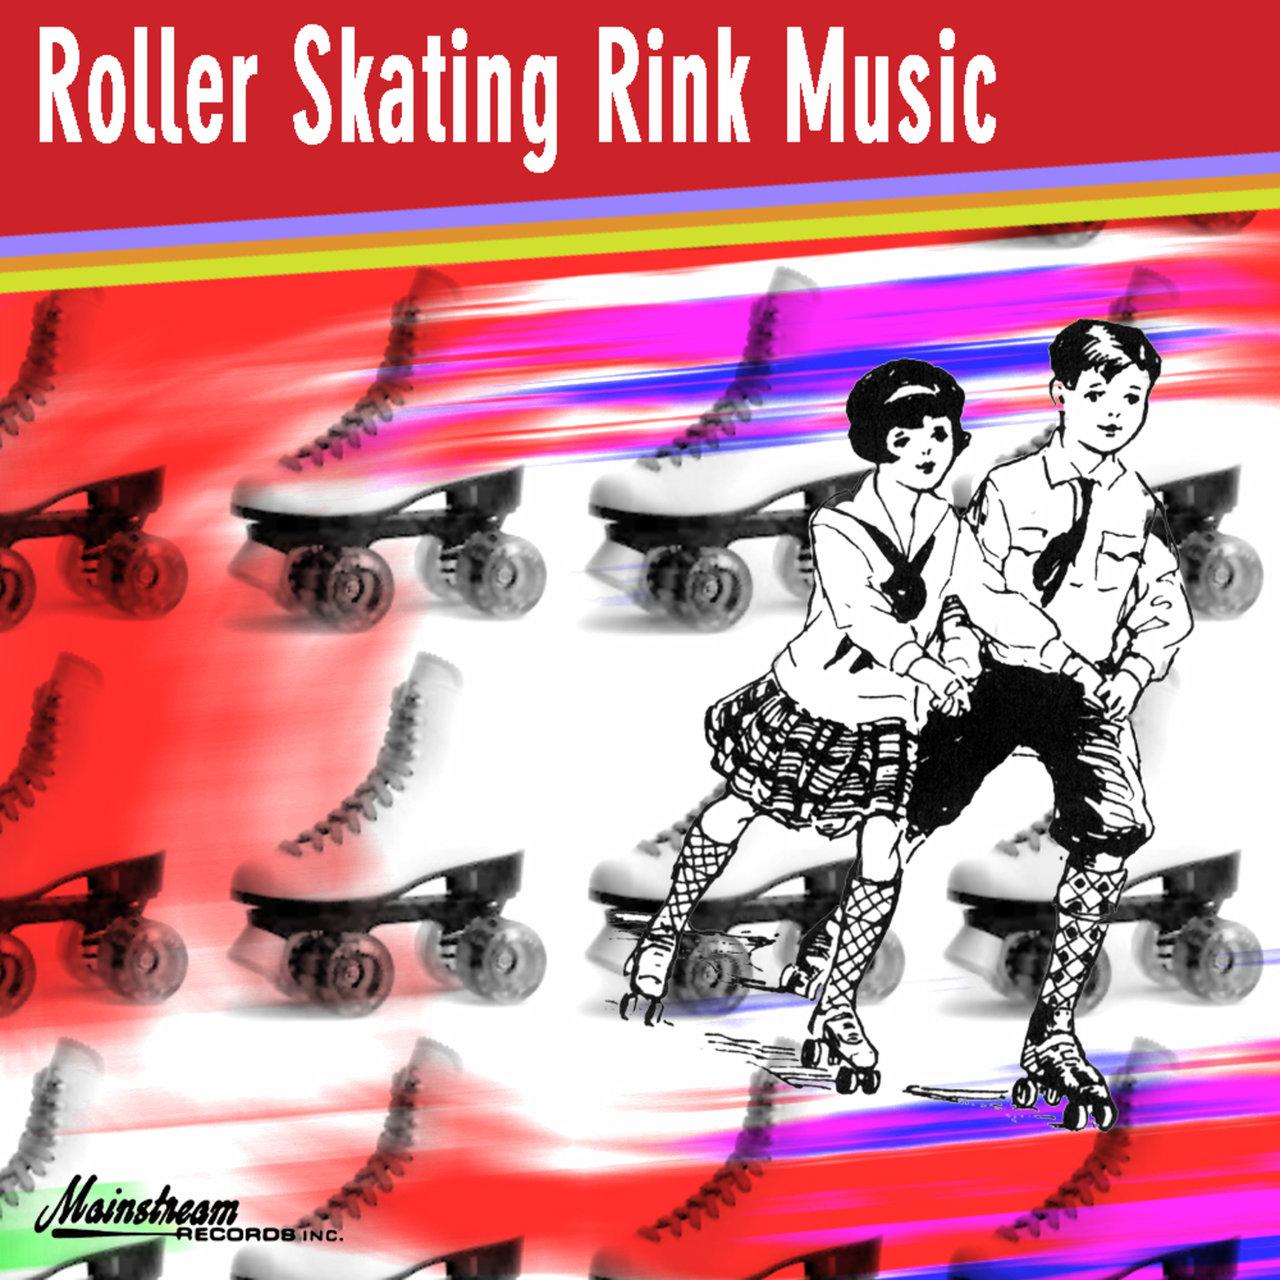 Roller skating rink music - Roller Skating Rink Music 6